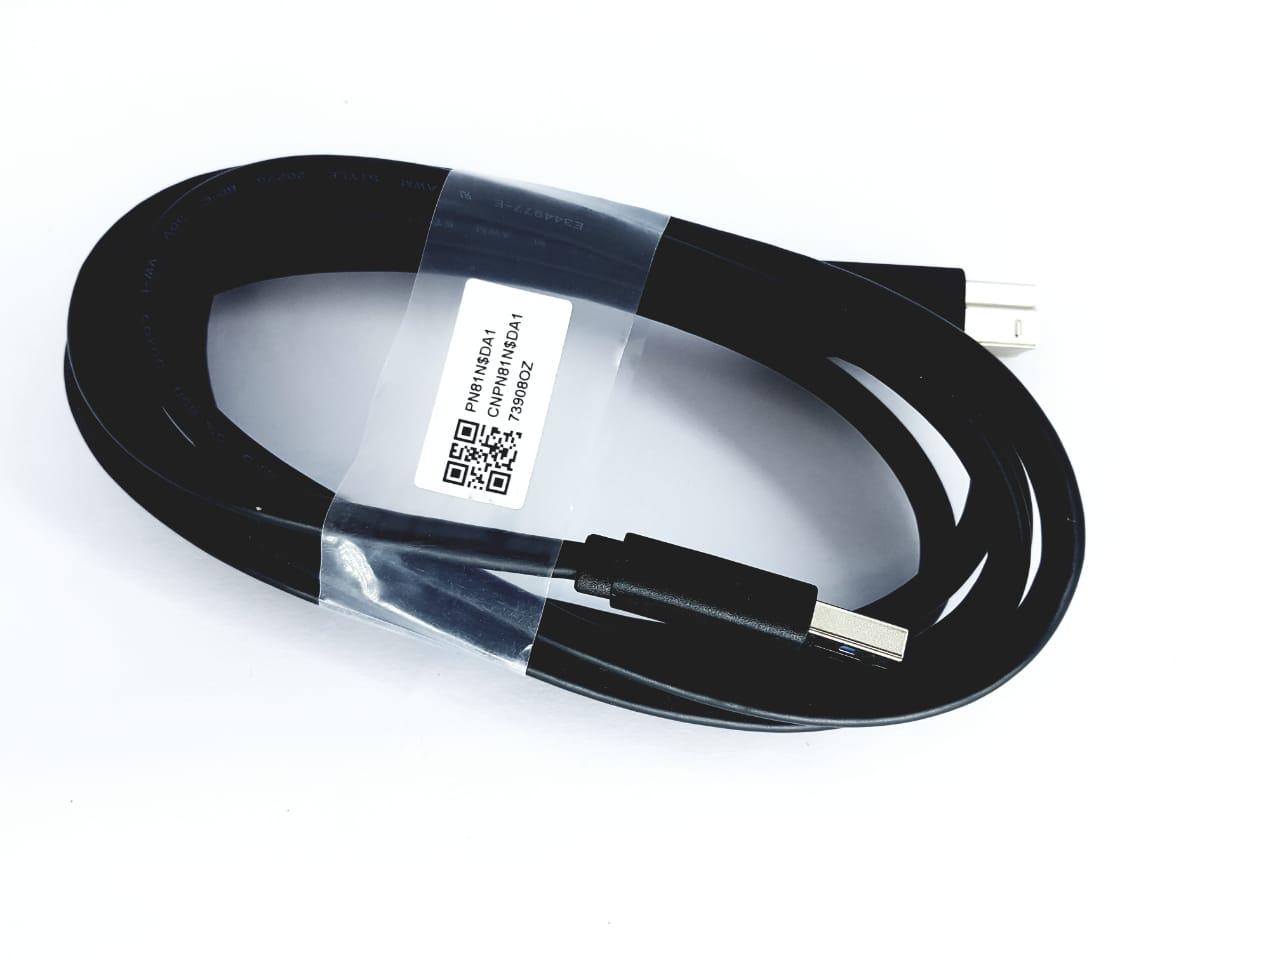 Cabo USB 3.0 para Monitor Vídeo PN81N DA1  1,80 mt AWM 30 v 80°C